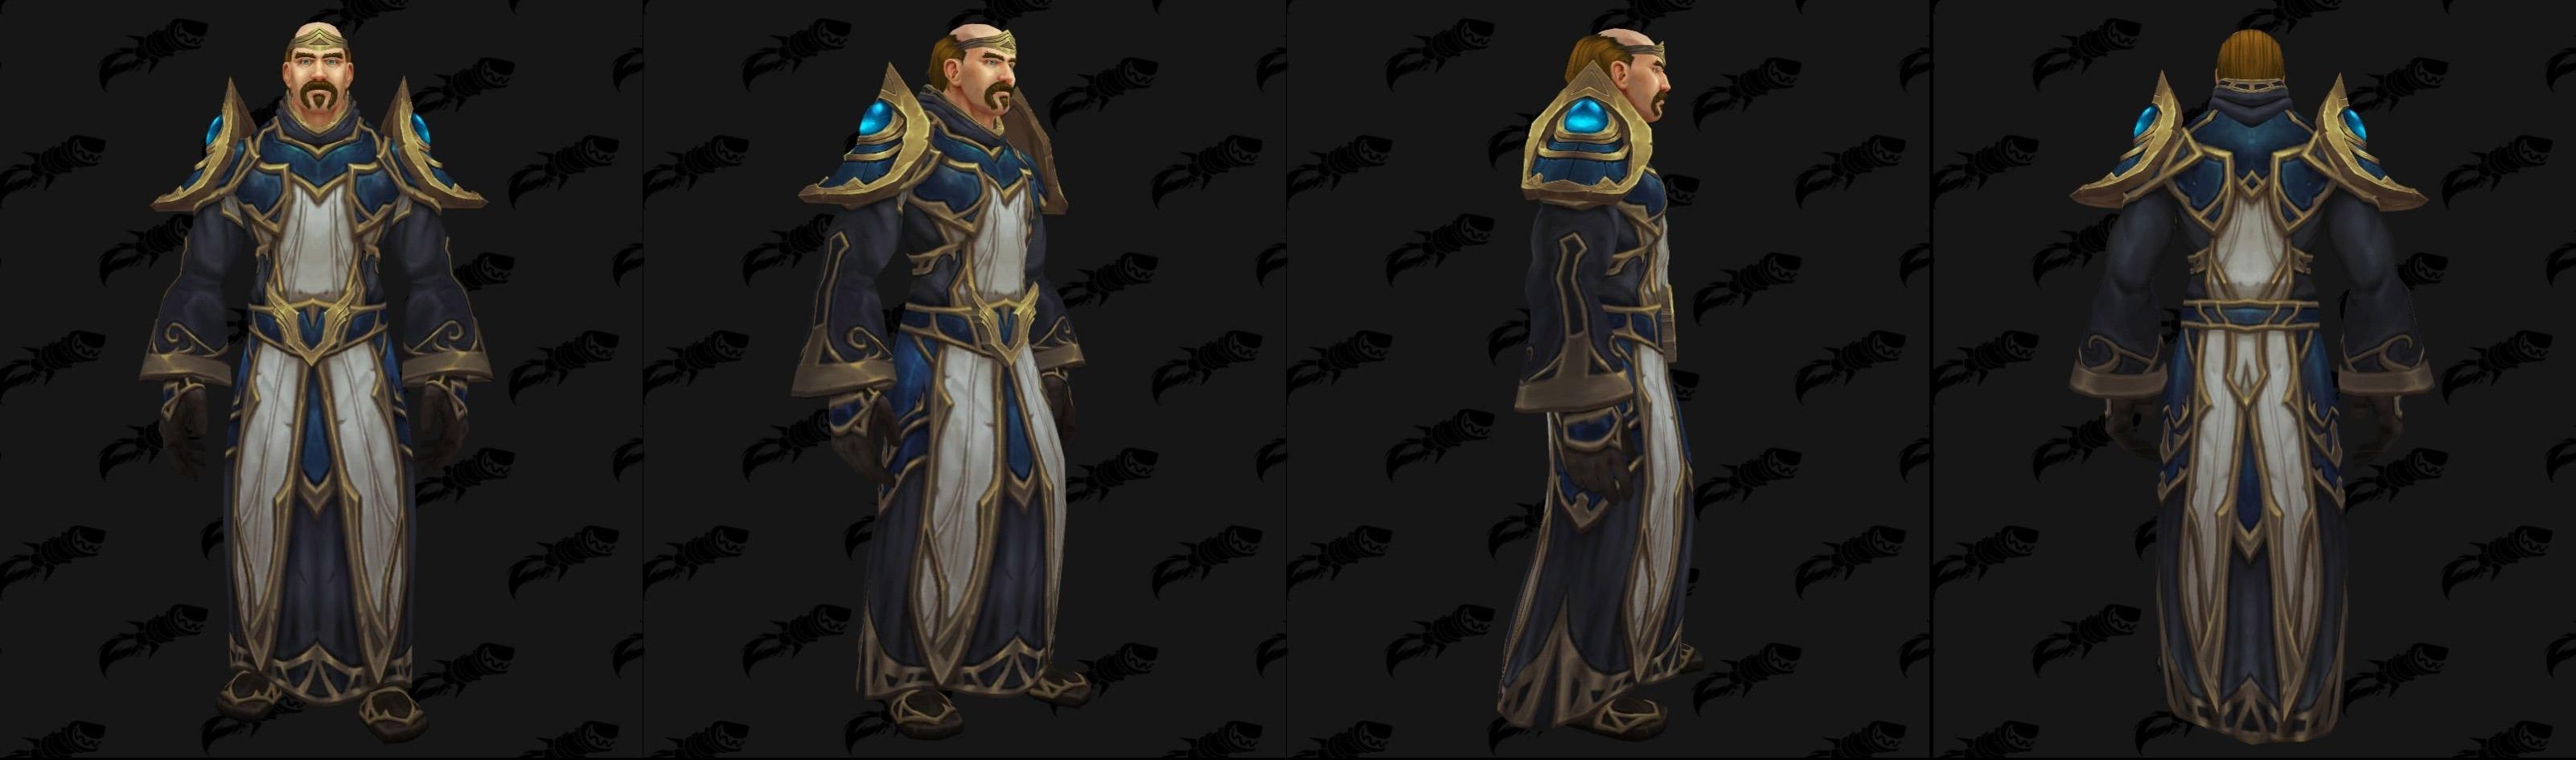 Armures tissu (Alliance) - Fronts de guerre Tier 1 - Coloris 3